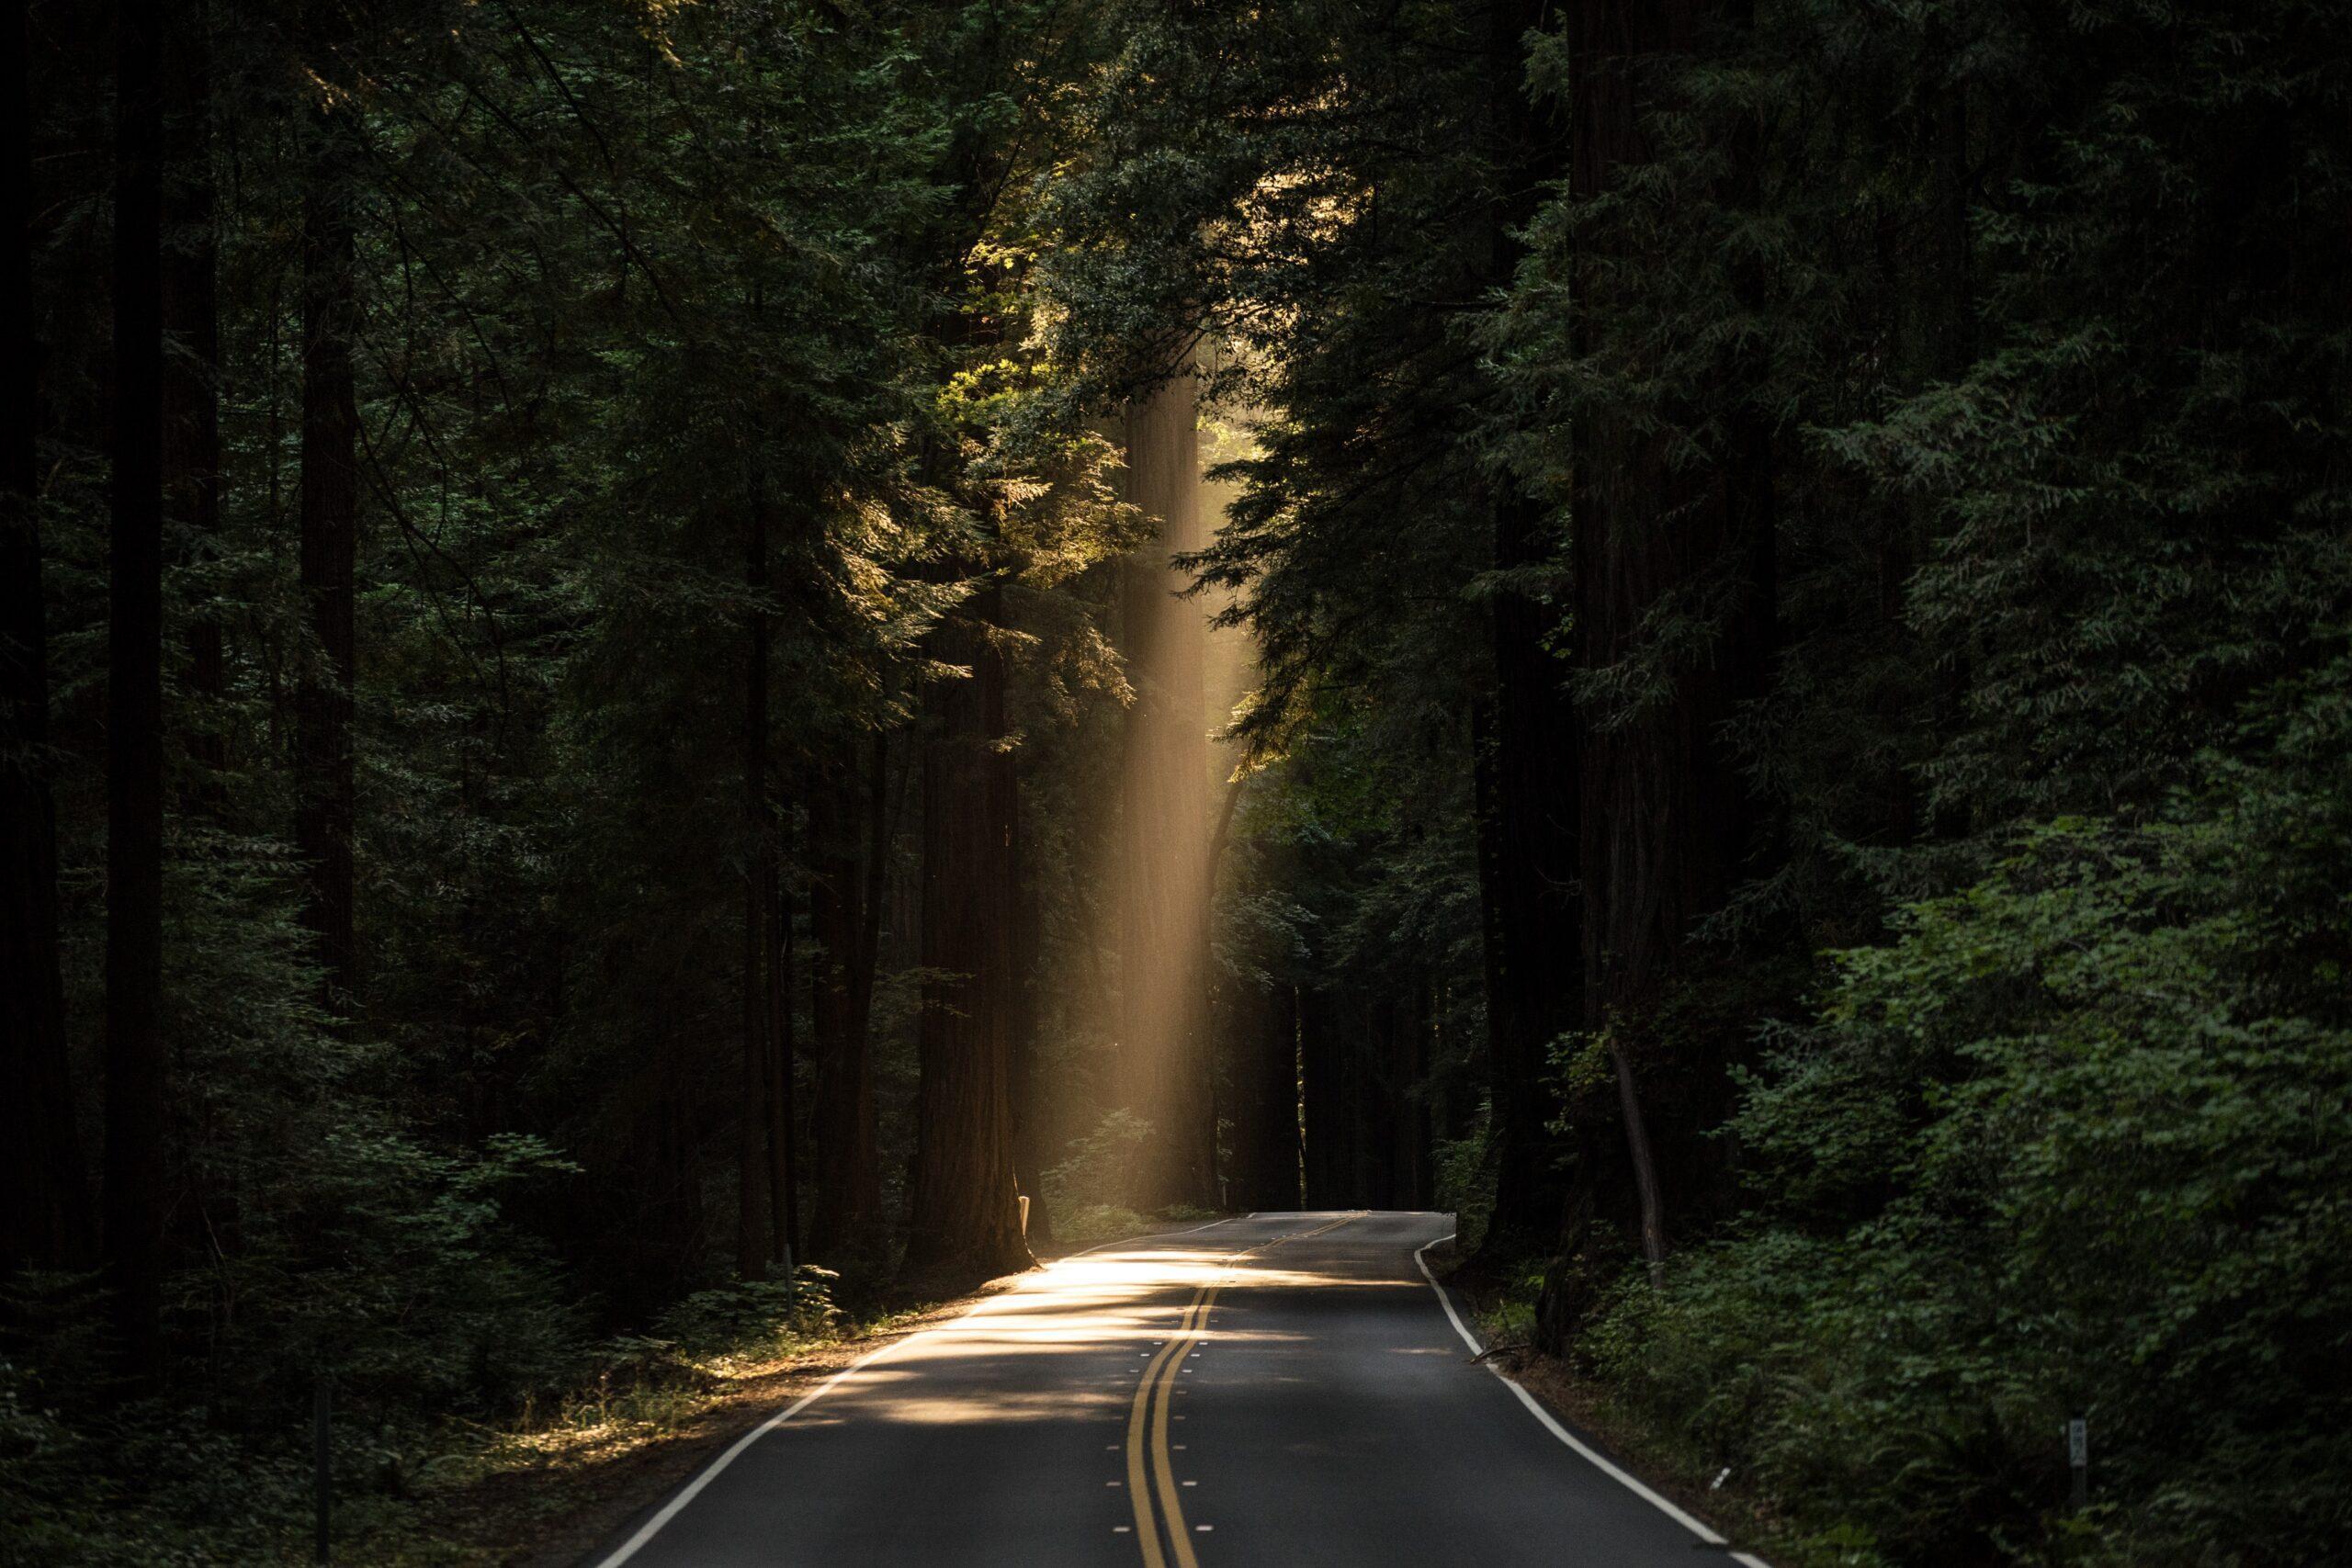 john-towner-Tree lined Country Road li-unsplash